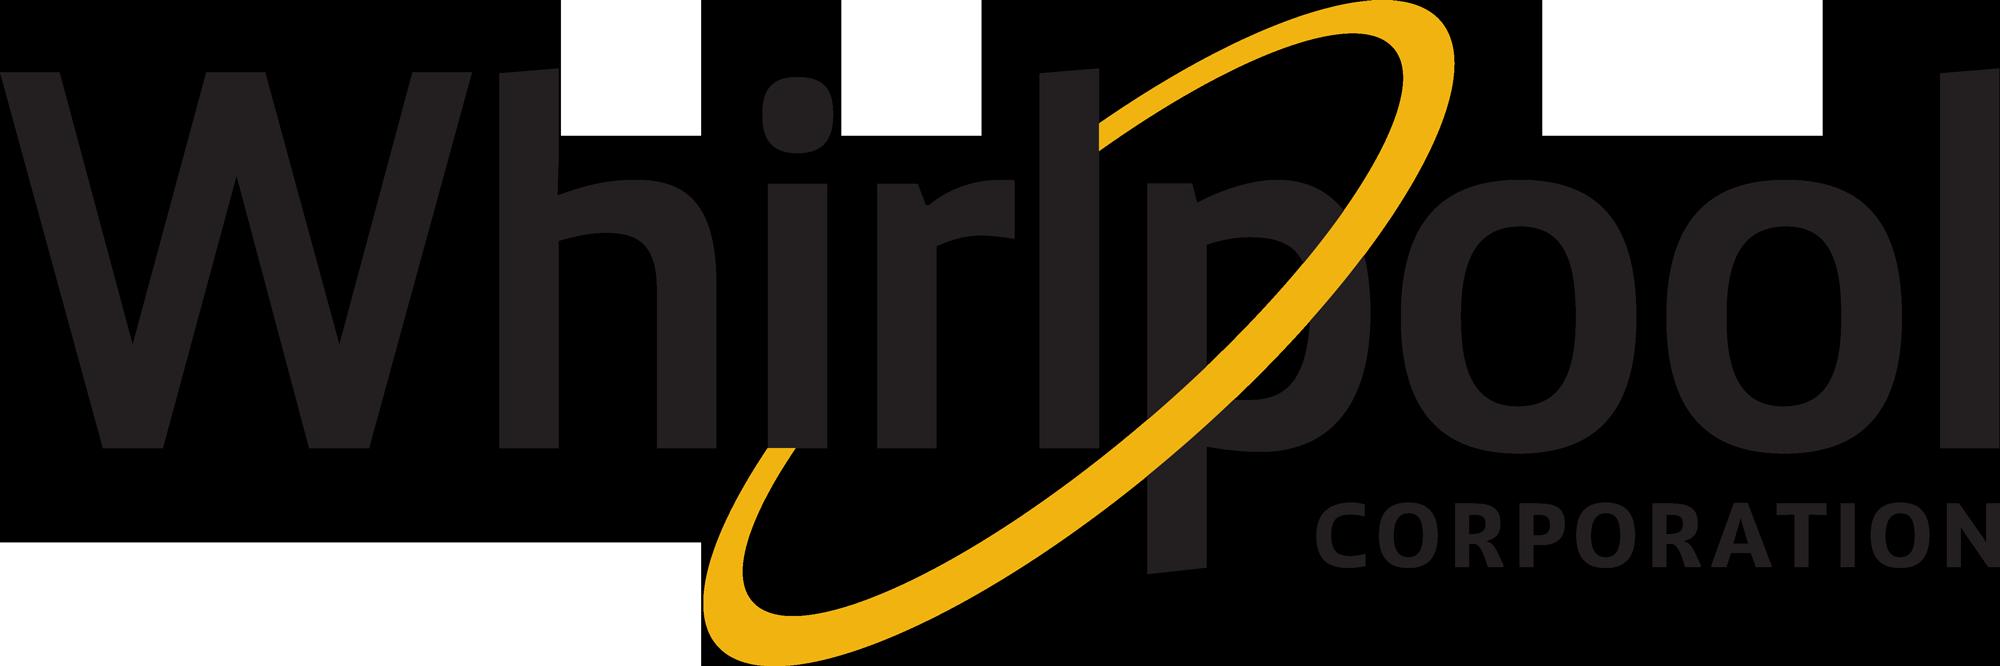 WhirlpoolCorp-2017Logo_2C_B.png